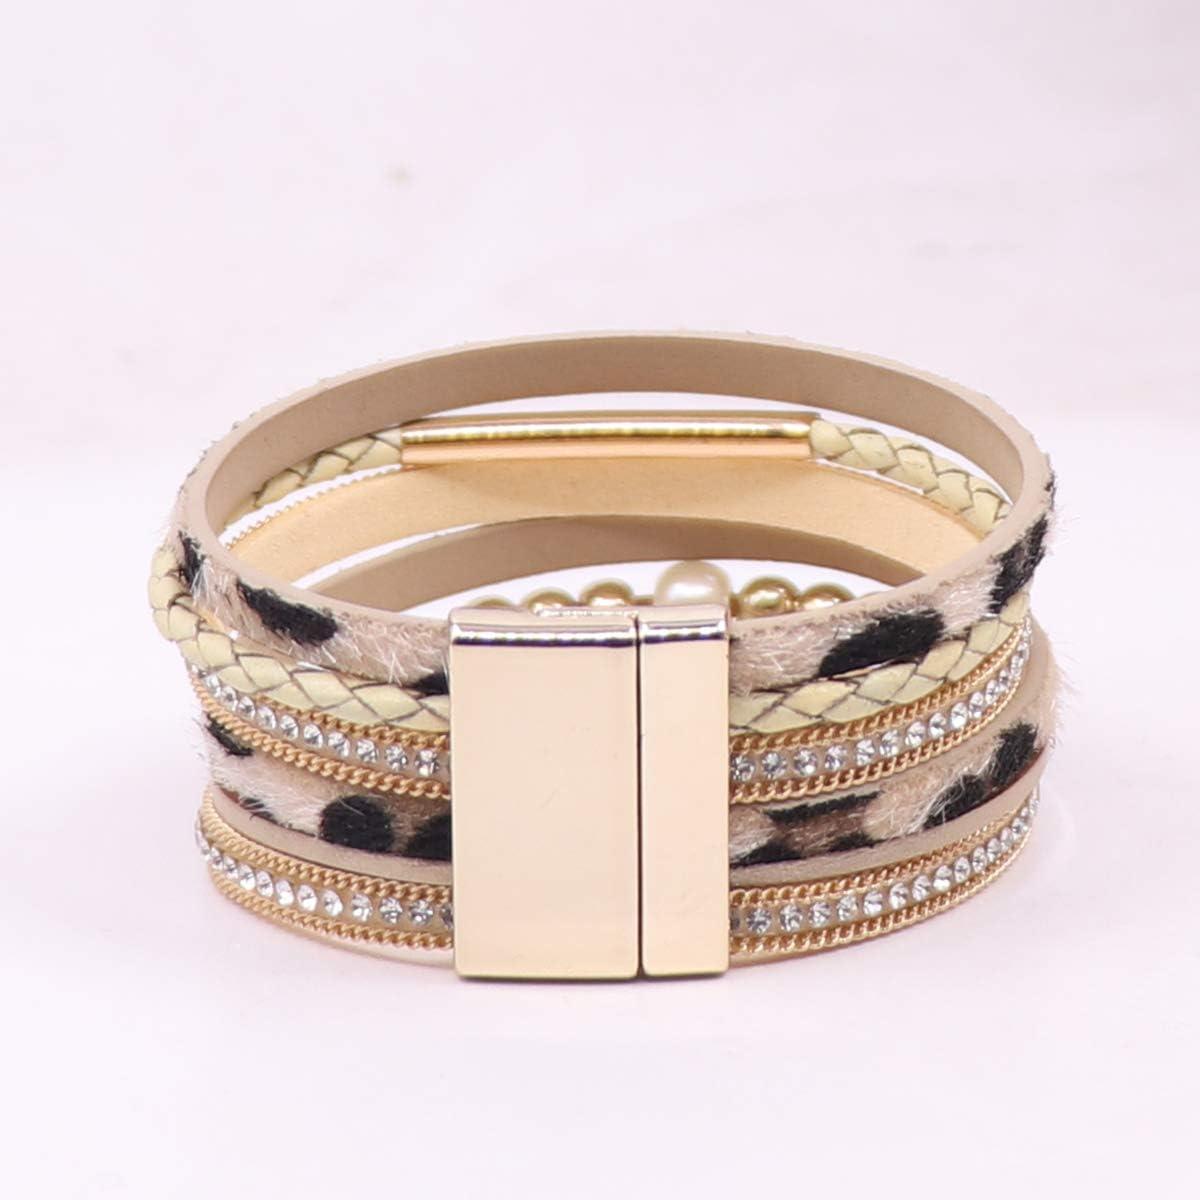 KSQS Multi-Layer Leather Wrap Cuff Bracelet, Boho Wide Braided Buckle Bracelets for Women, Waterproof Leather Wristband Bangles